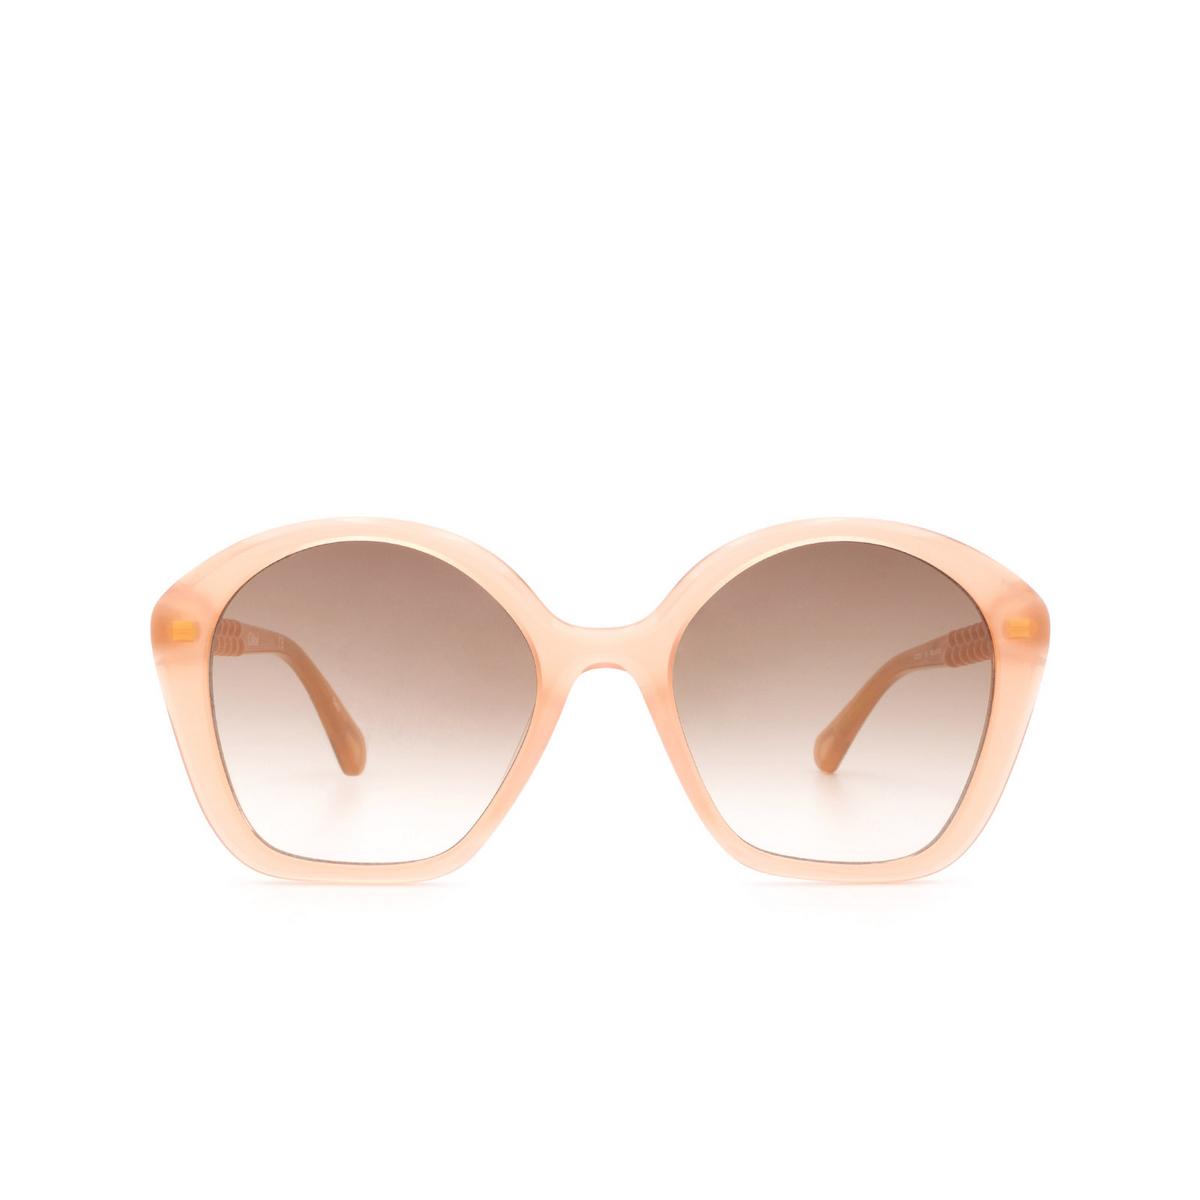 Chloé ® Irregular Sunglasses: CC0001S color Nude 001.